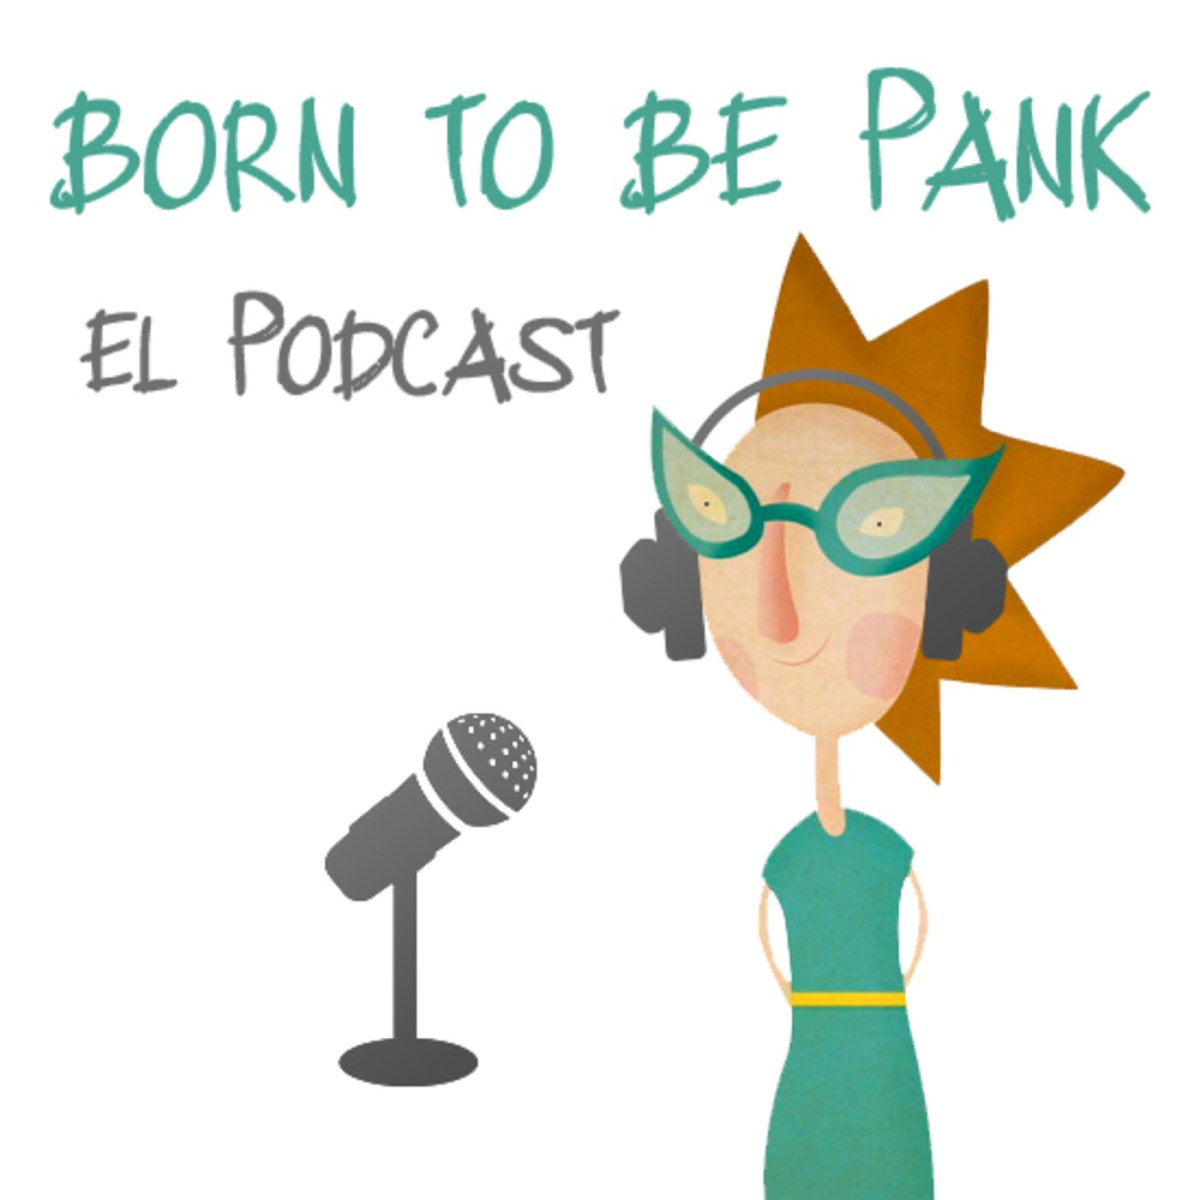 Born To Be Pank El Podcast